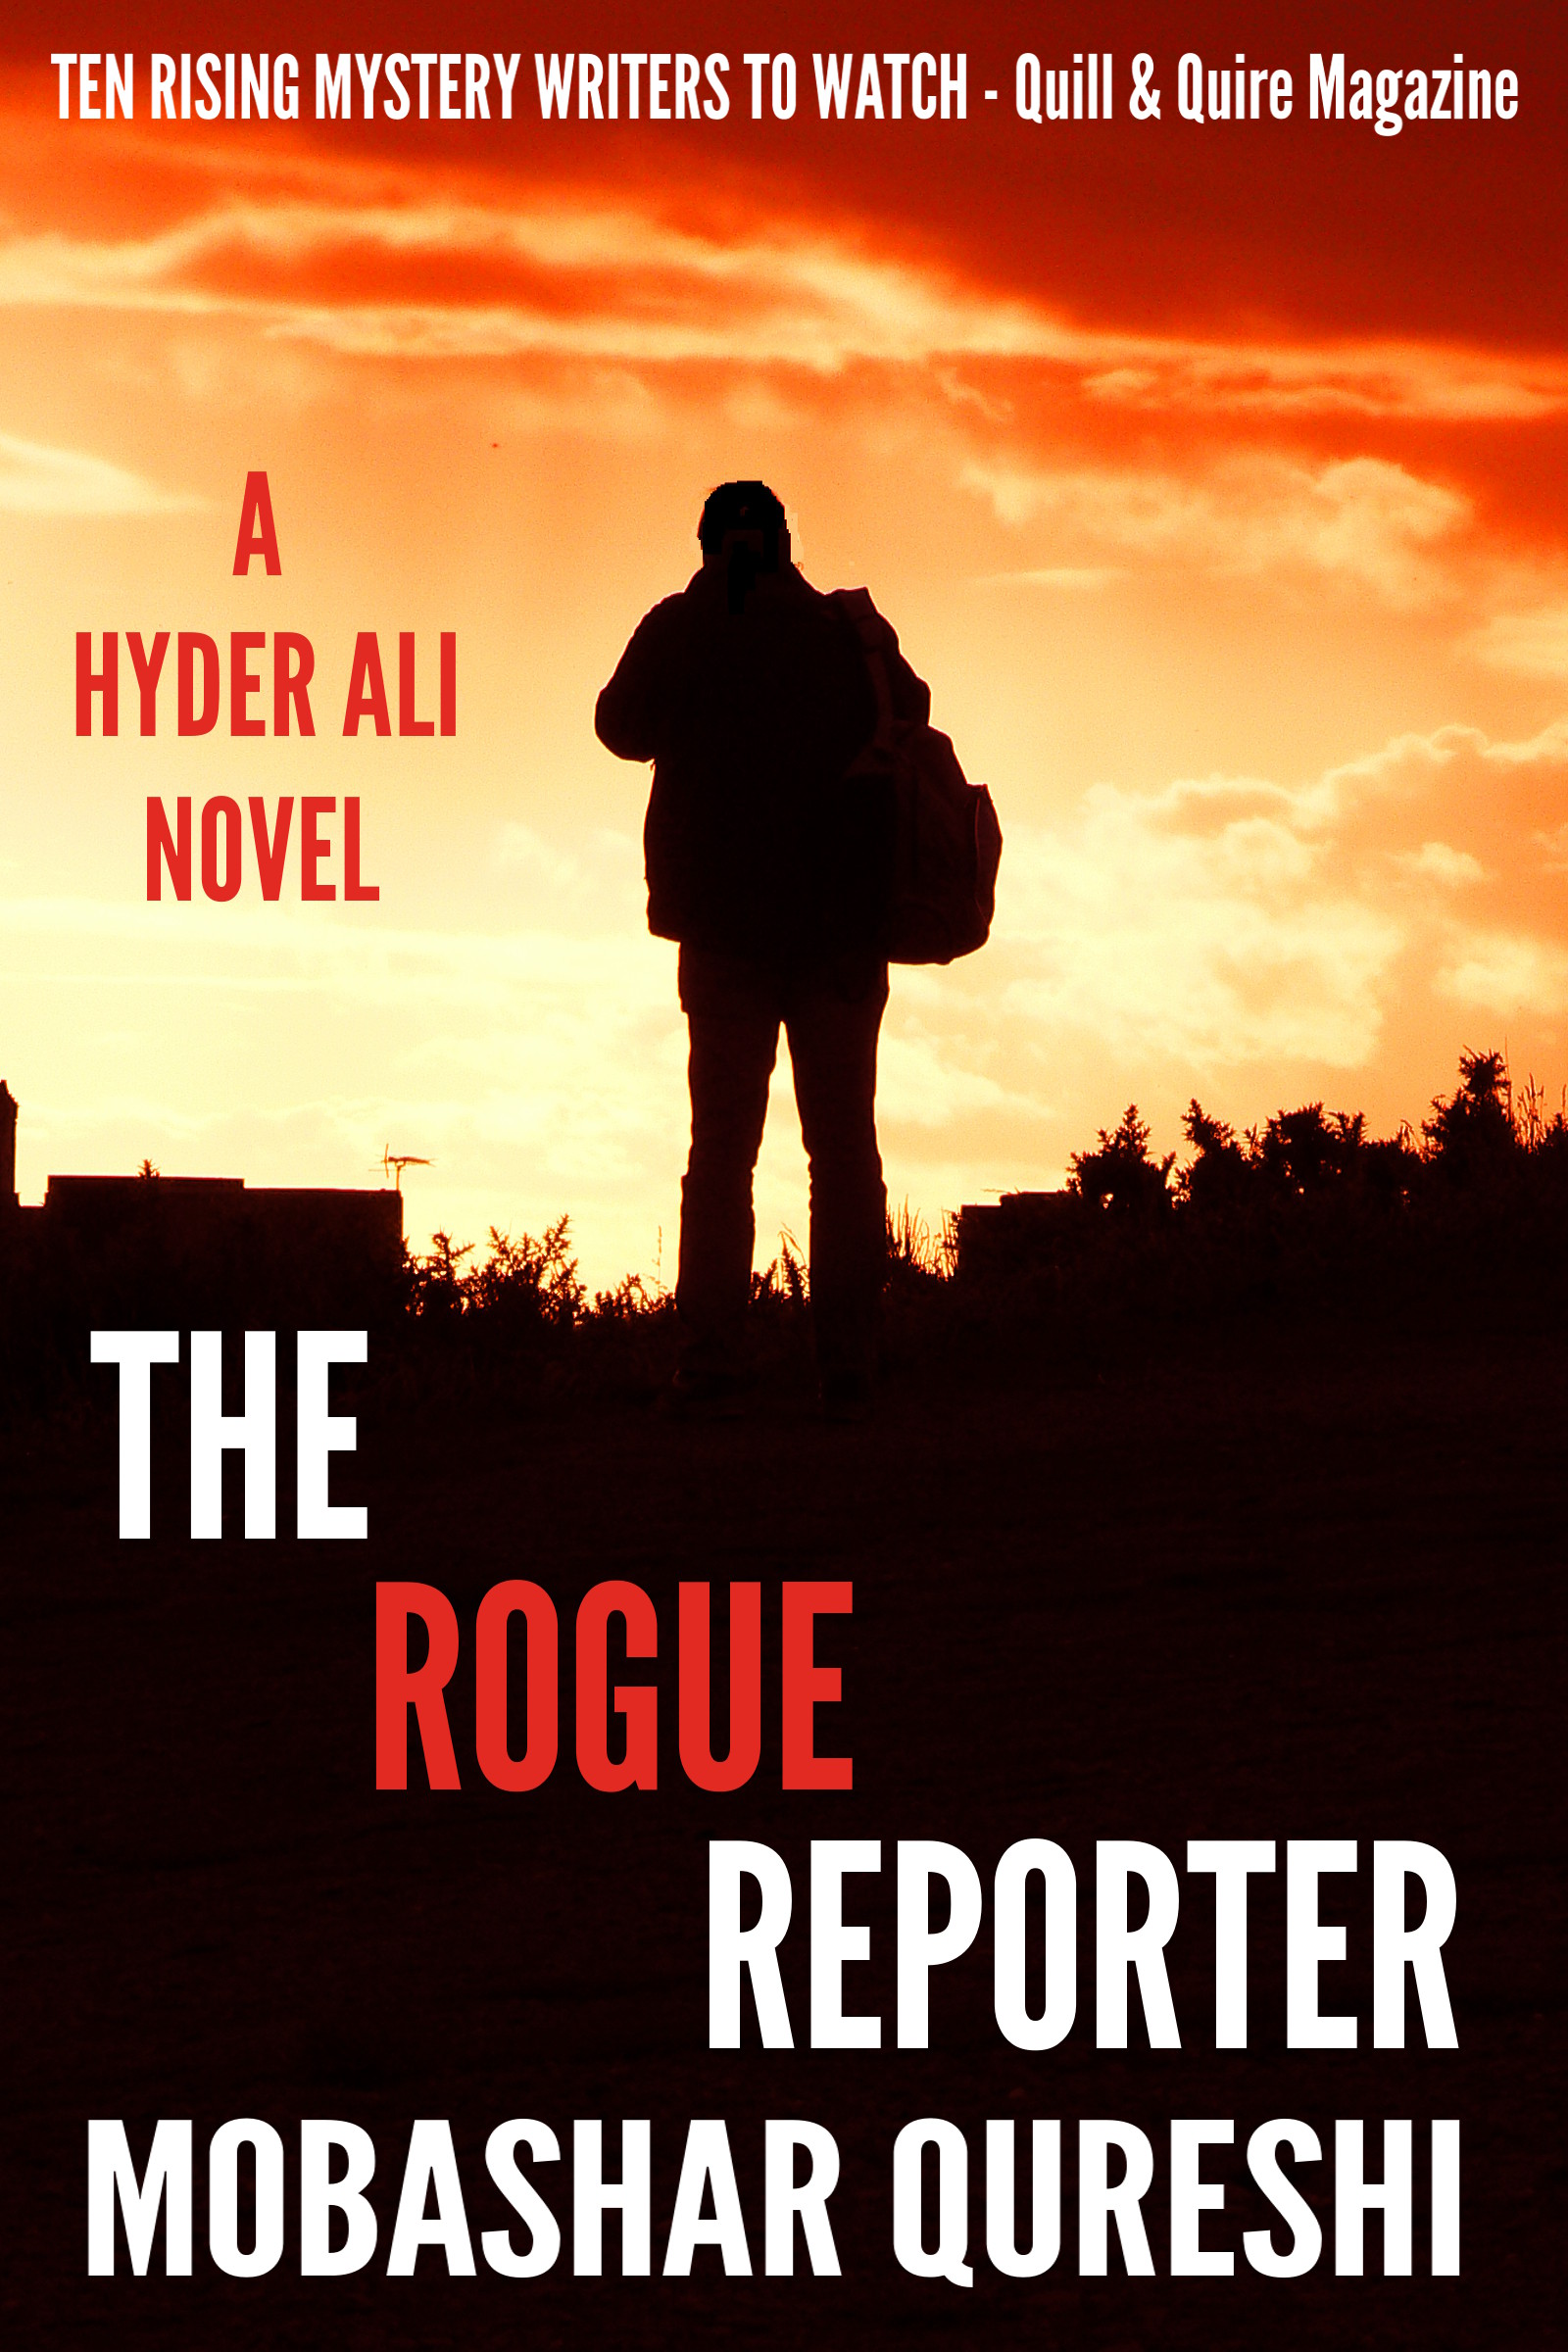 Rogue Reporter